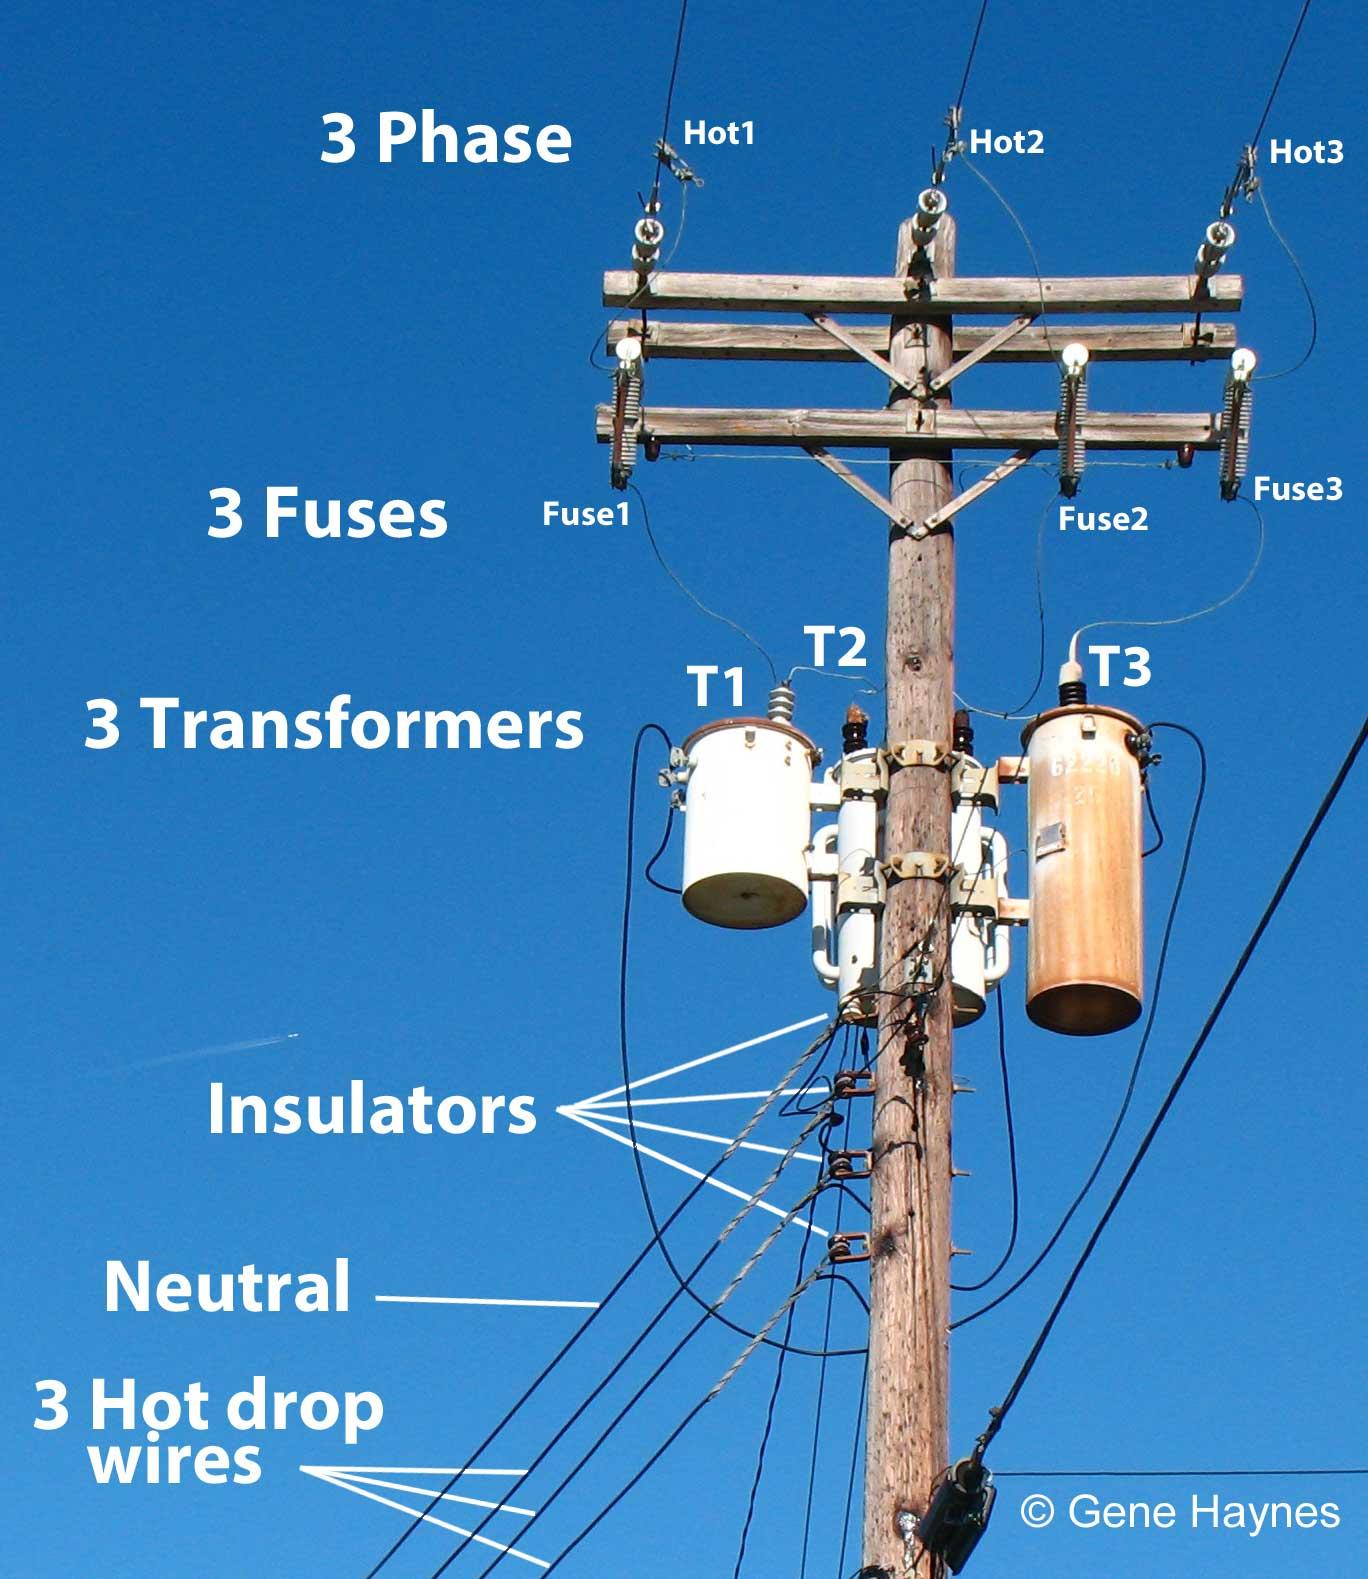 3 phase electric - Kubre.euforic.co